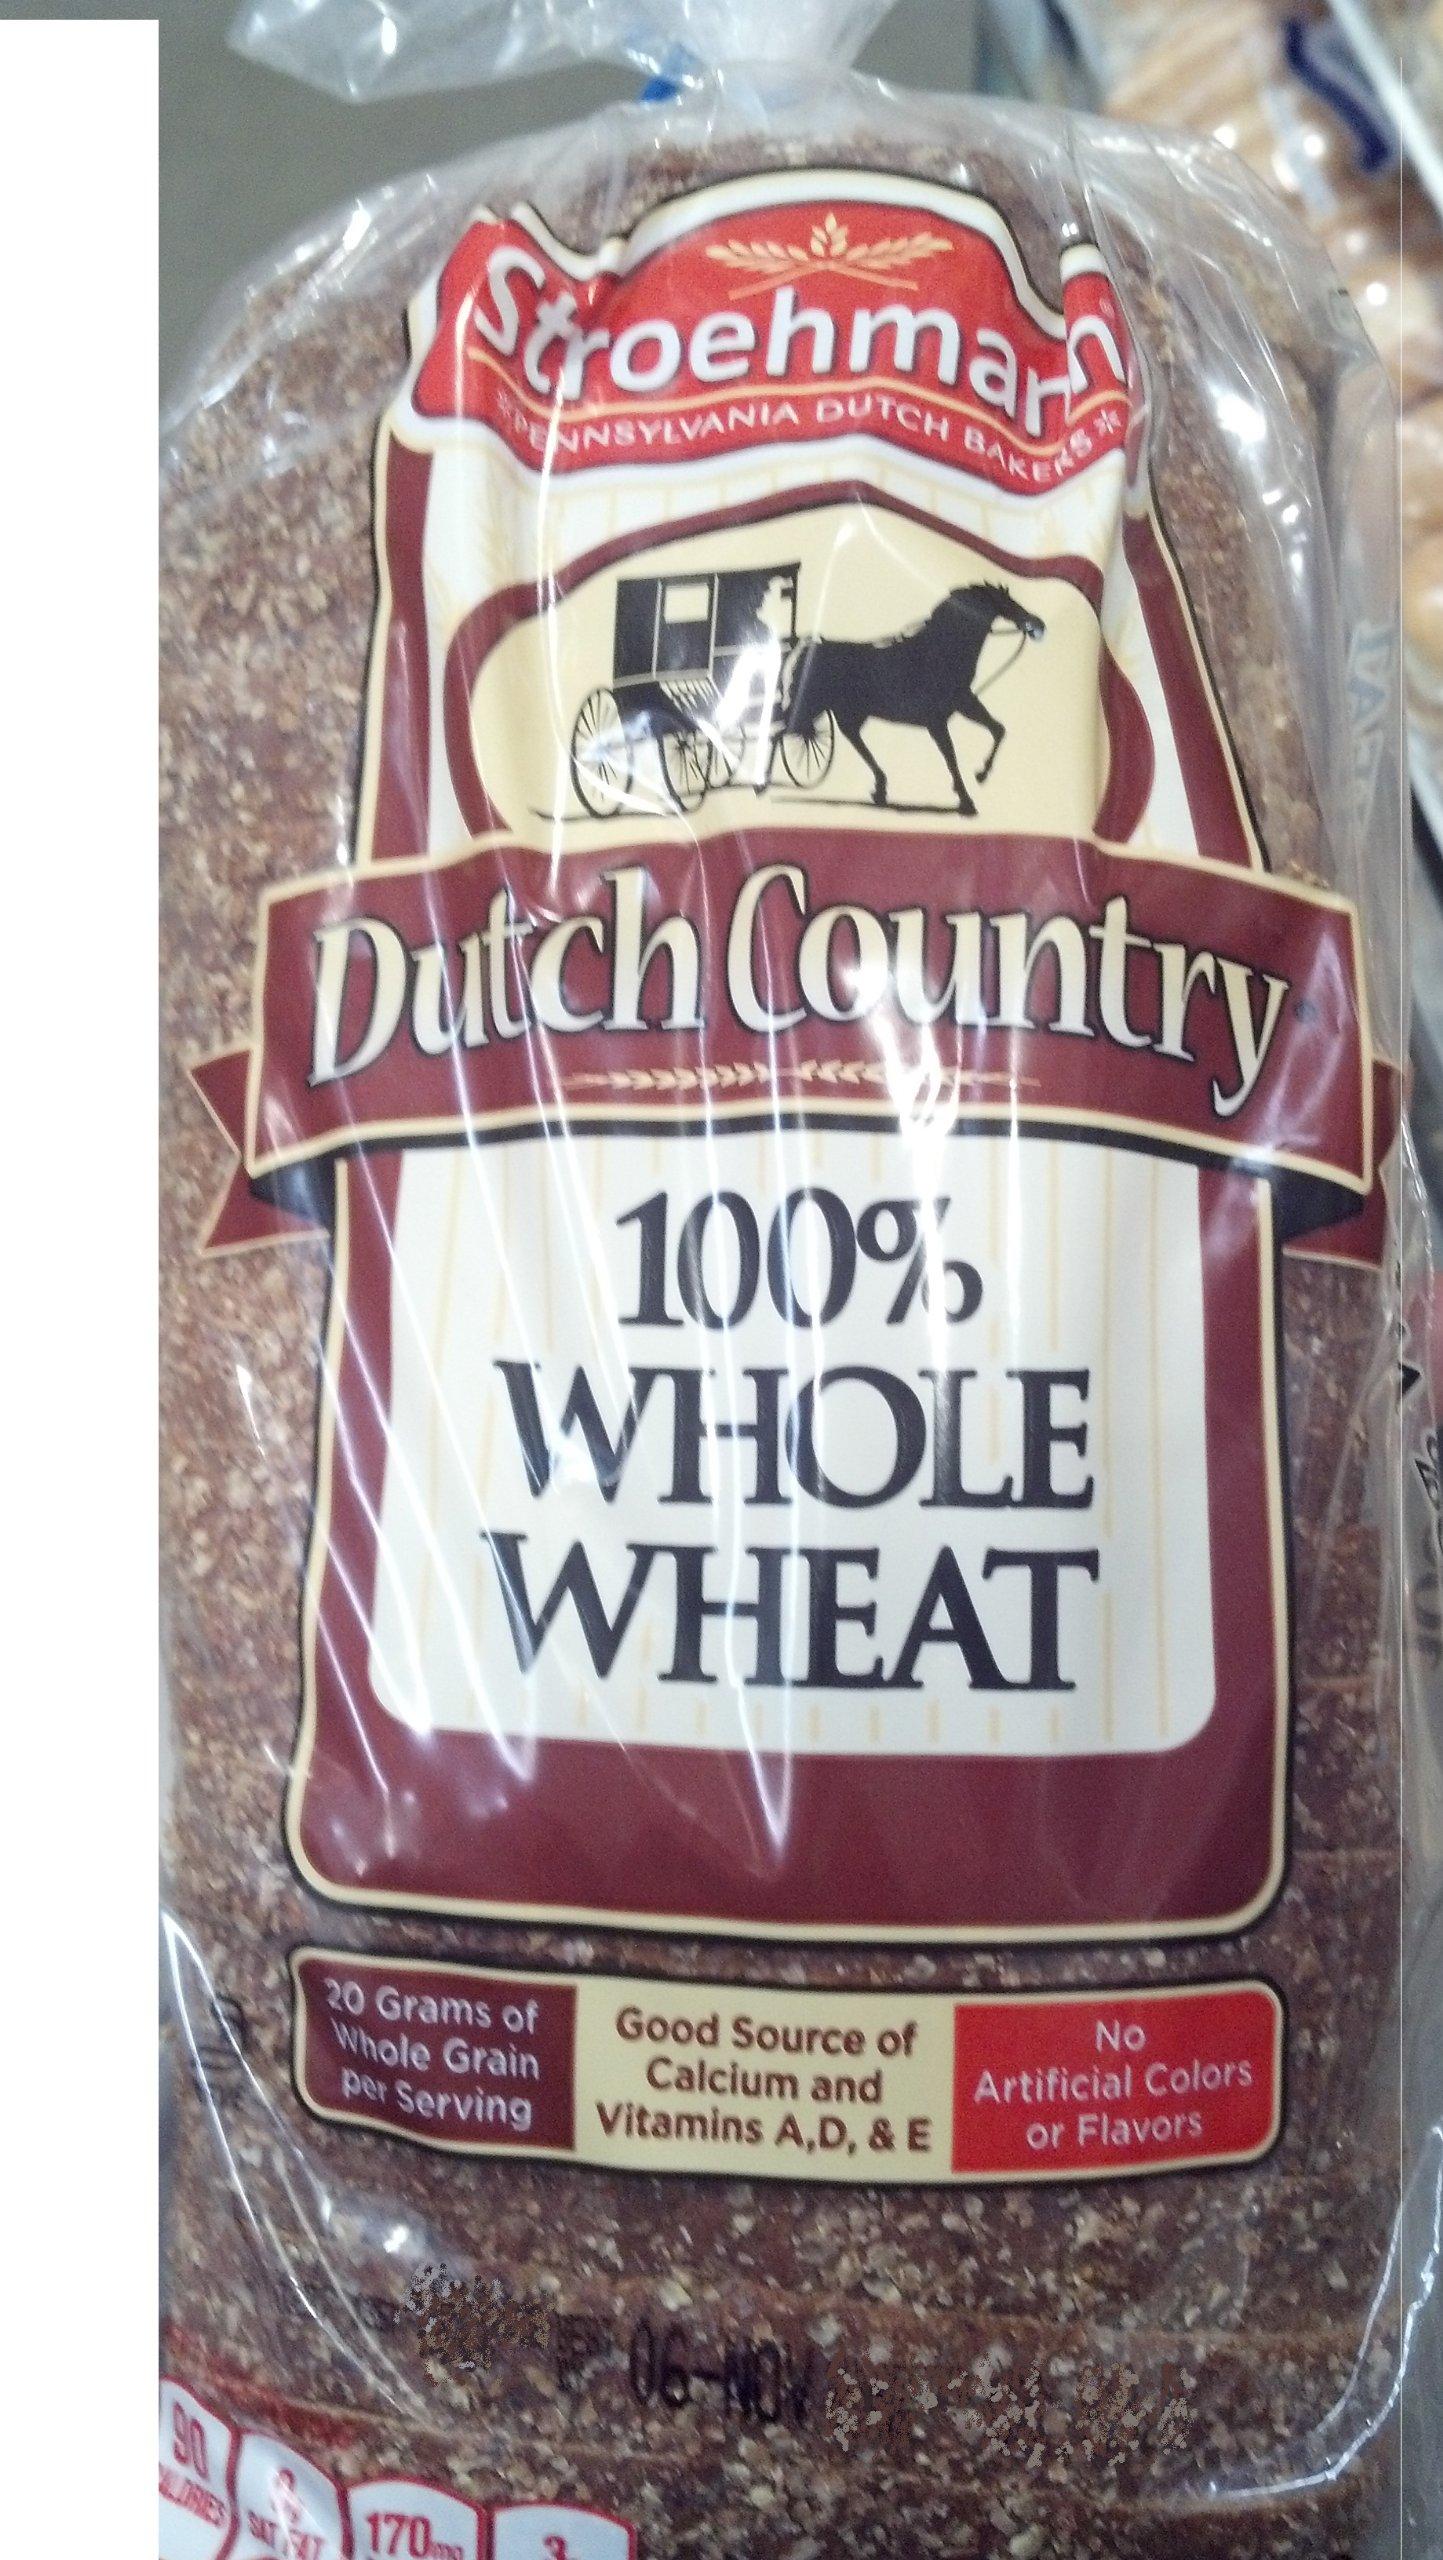 Stroehmann Dutch Country 100% Whole Wheat Bread. 2 Pack